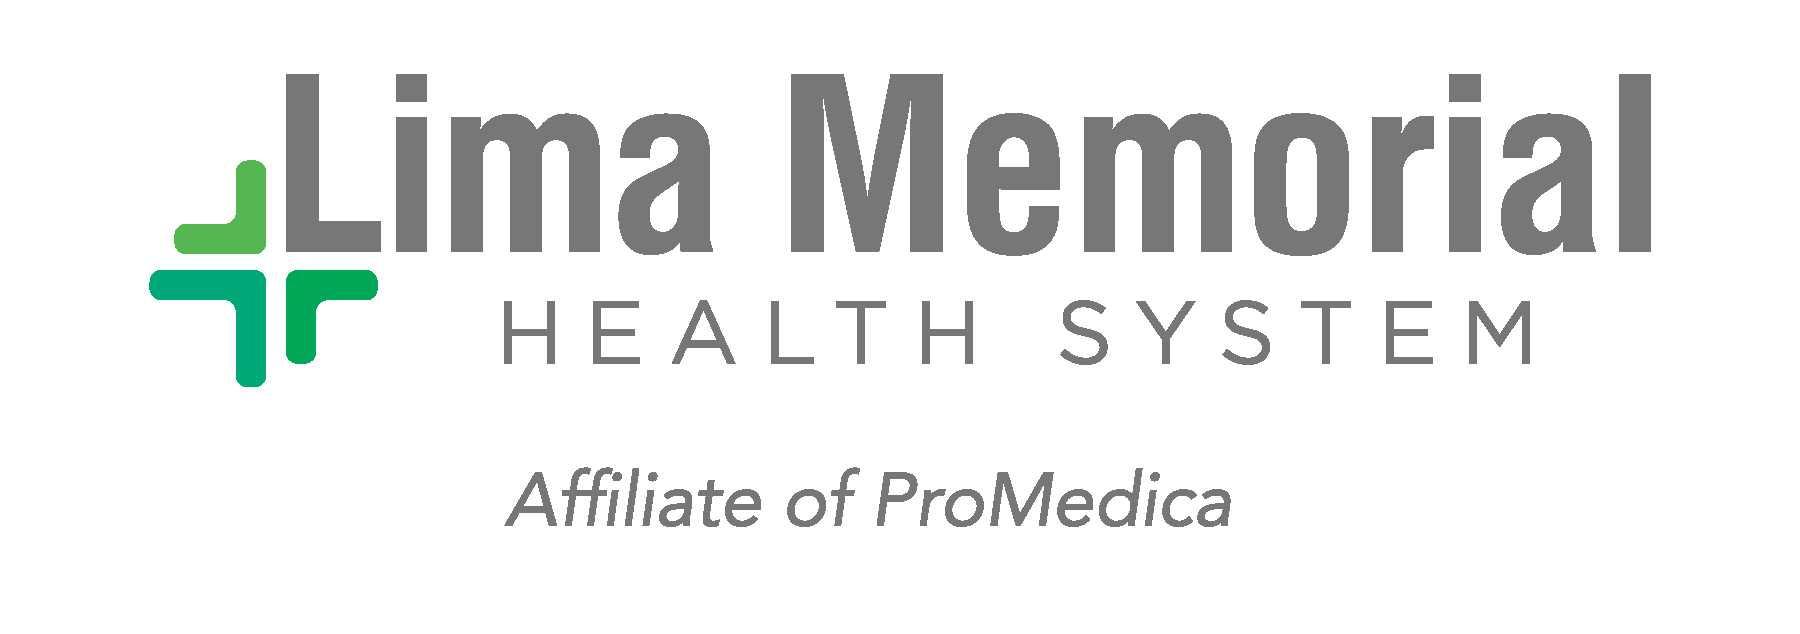 Lima Memorial Health System